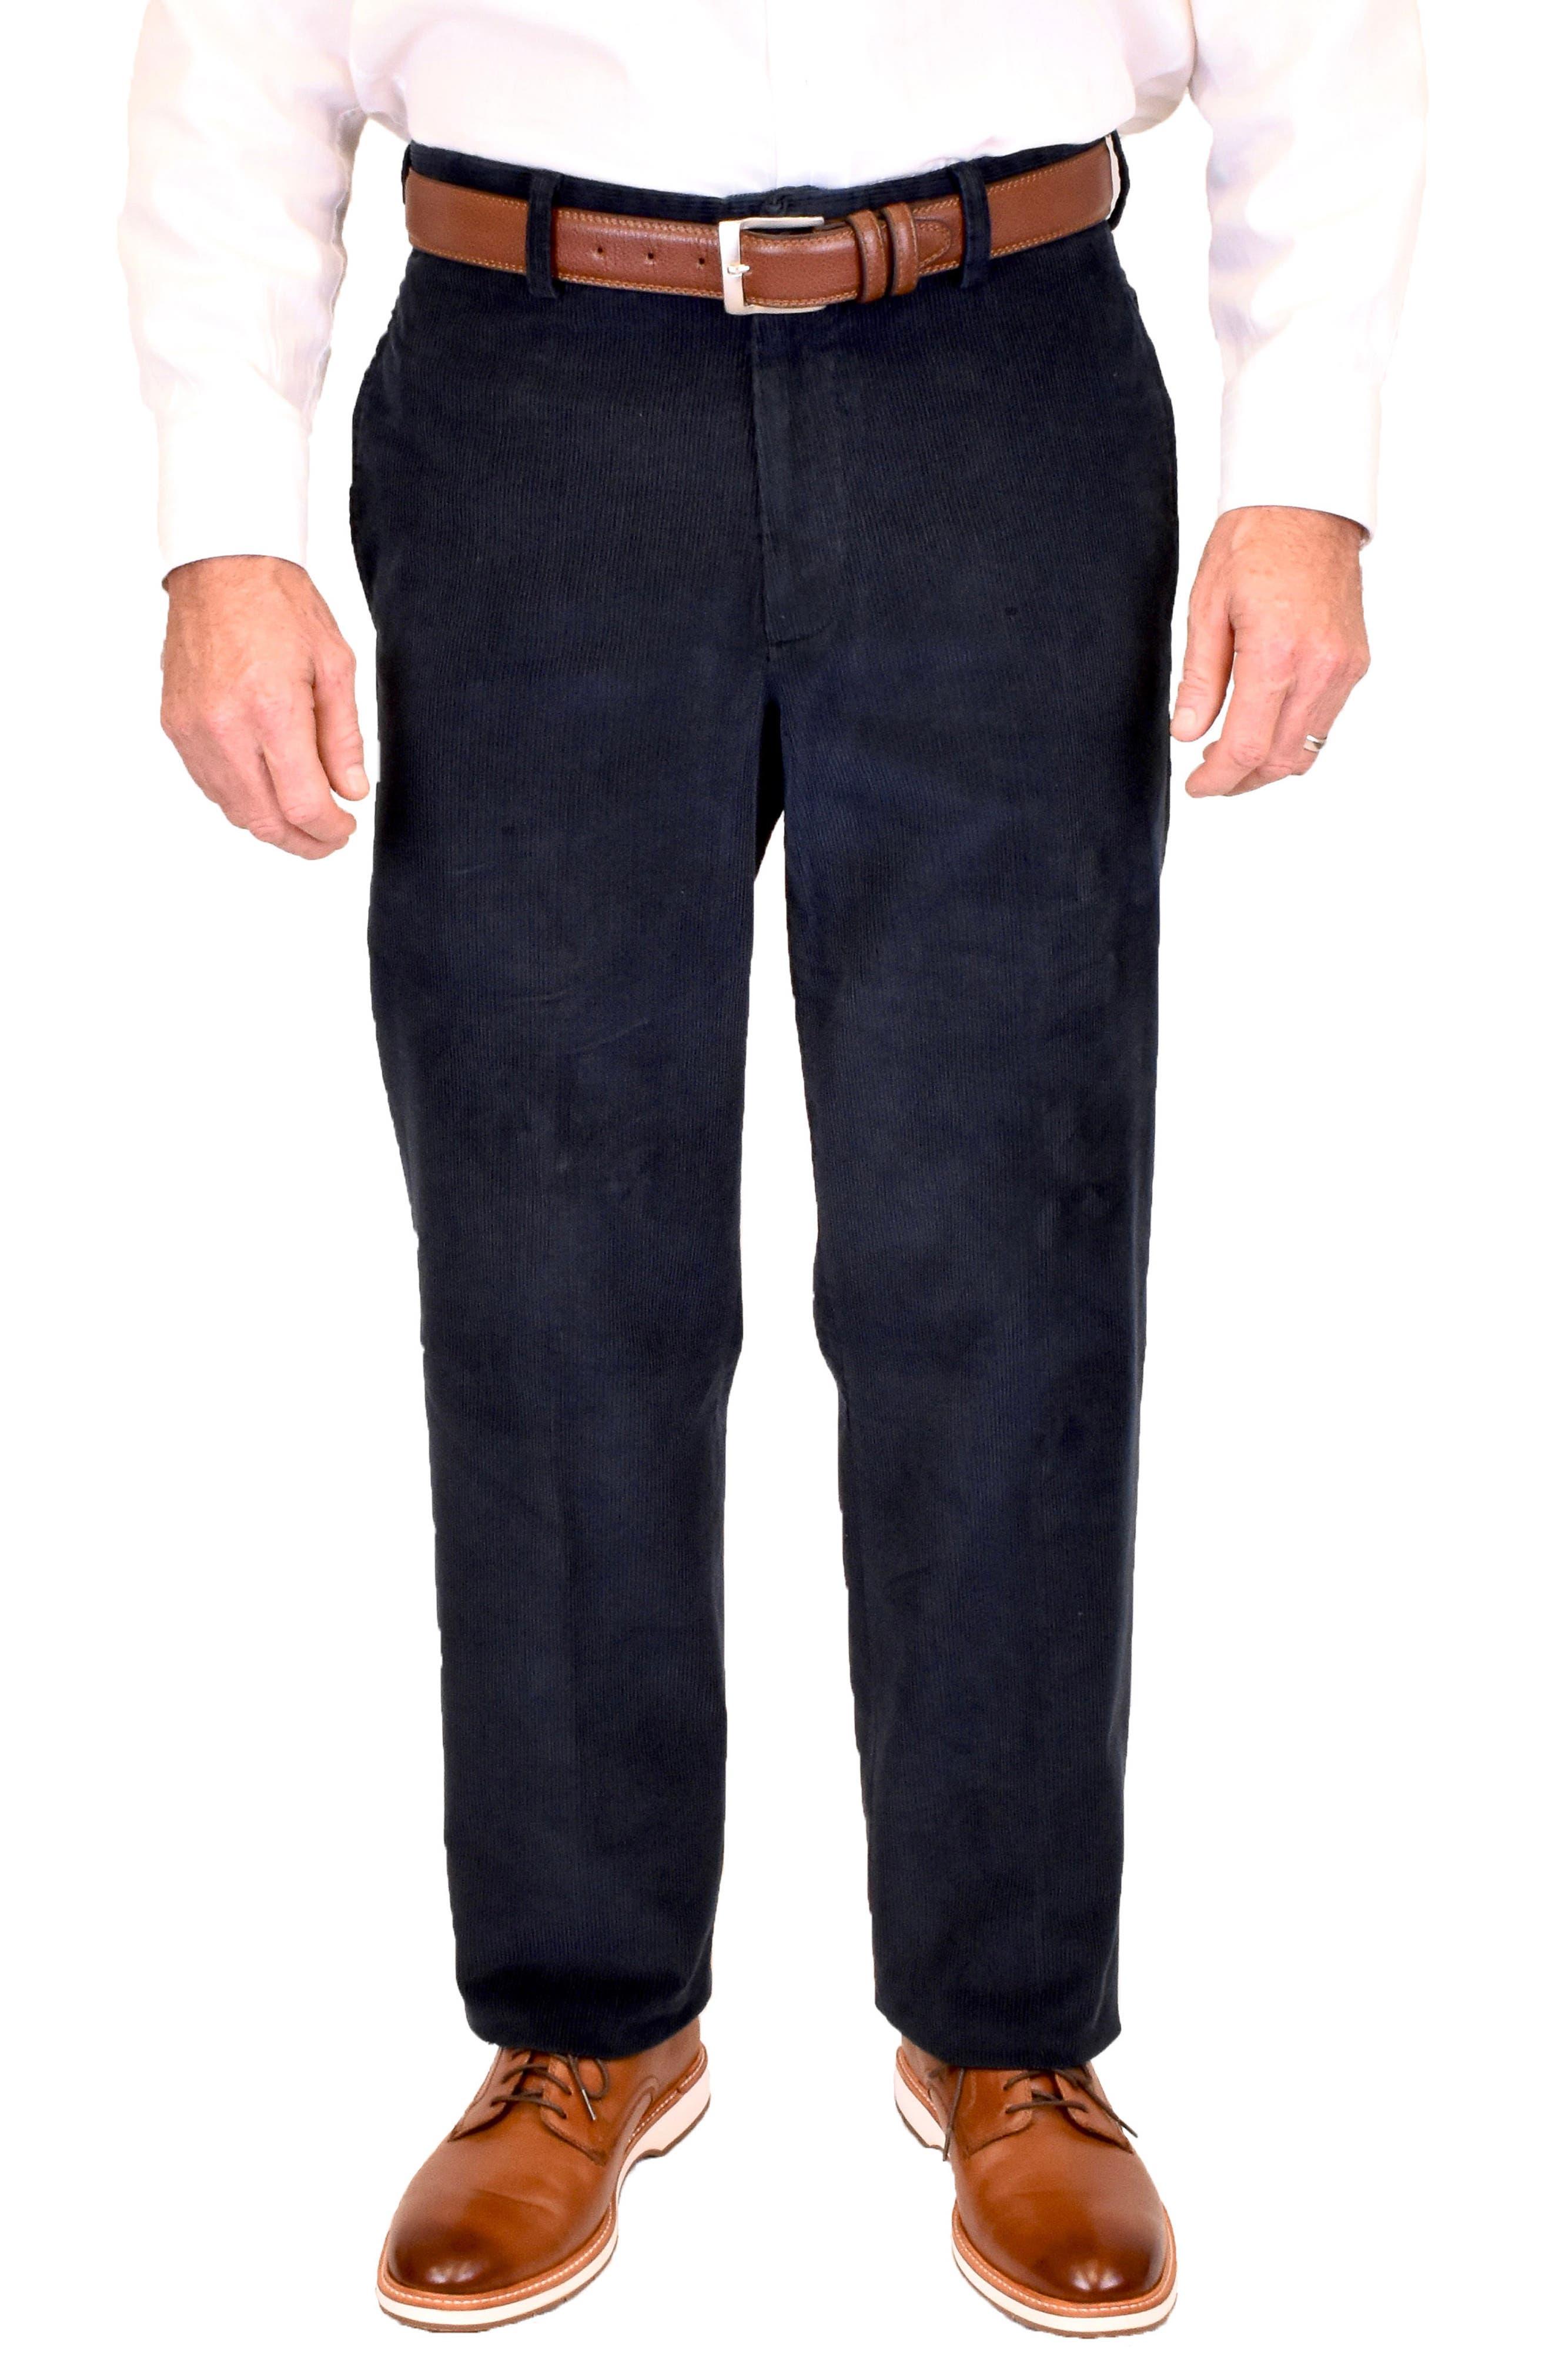 Charleston Flat Front Cotton Corduroy Dress Pants